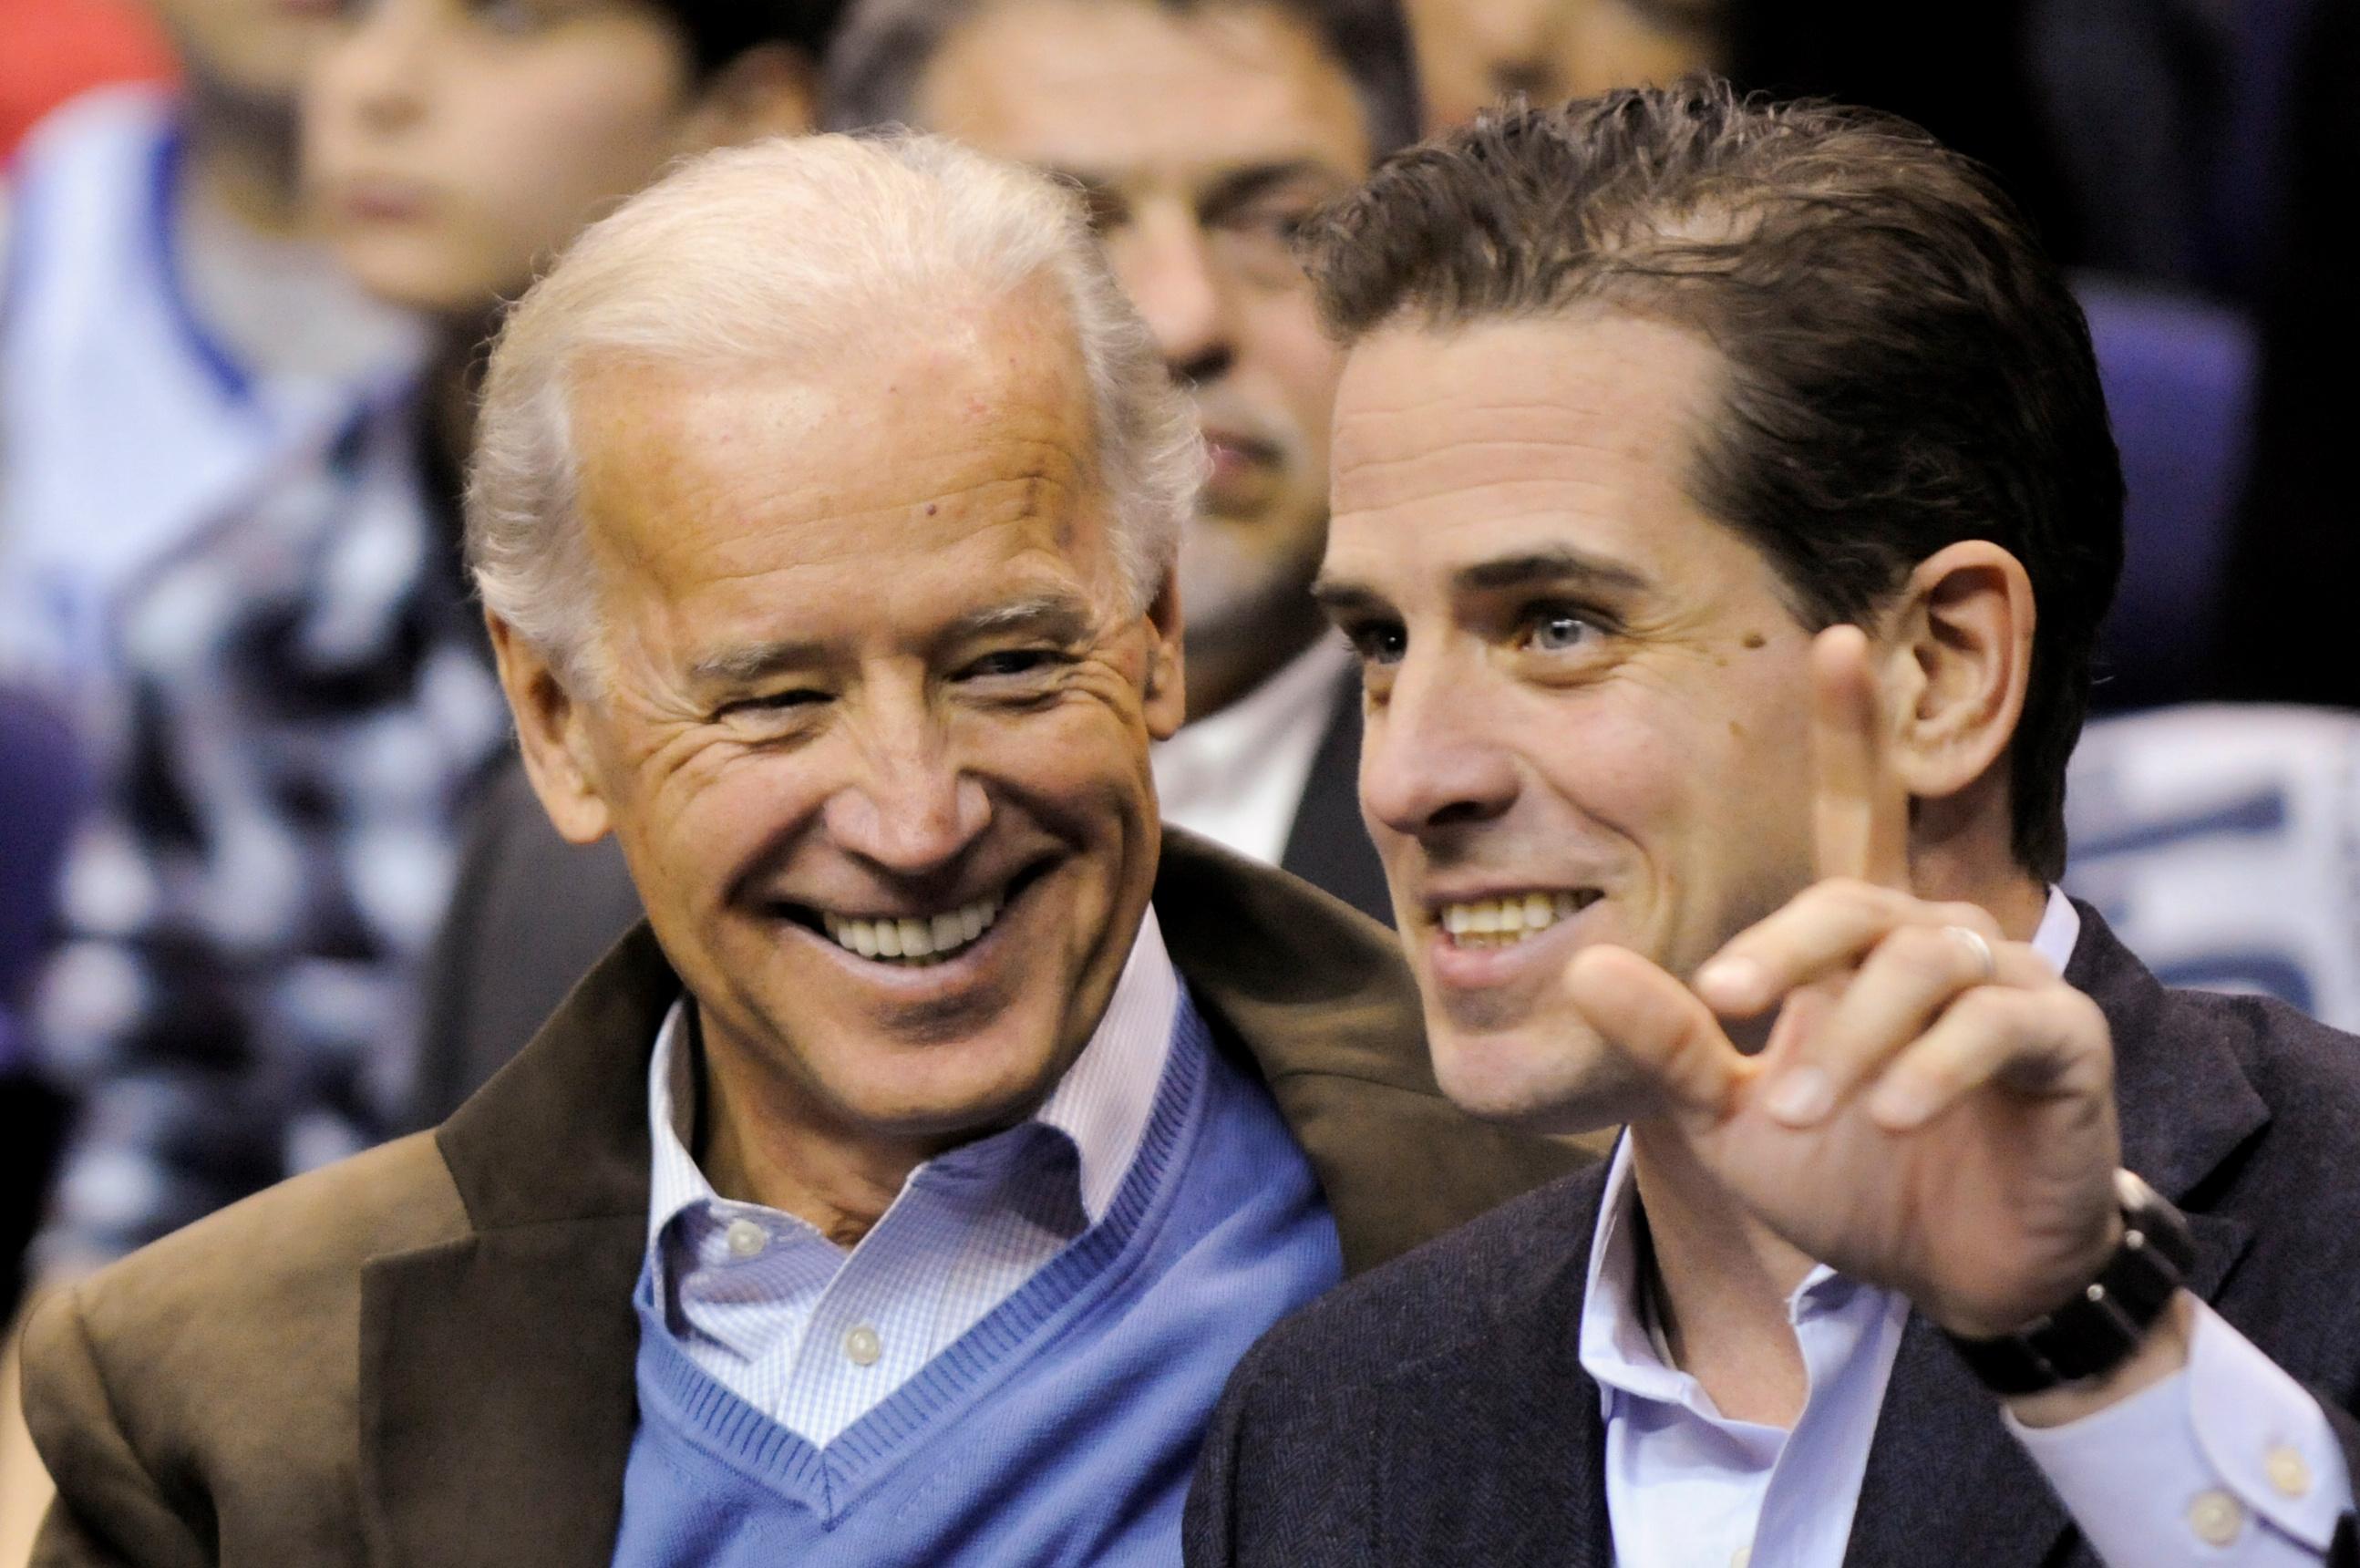 U.S. Vice President Joe Biden and his son Hunter Biden attend an NCAA basketball game between Georgetown University and Duke University in Washington, U.S., Jan. 30, 2010. REUTERS/Jonathan Ernst